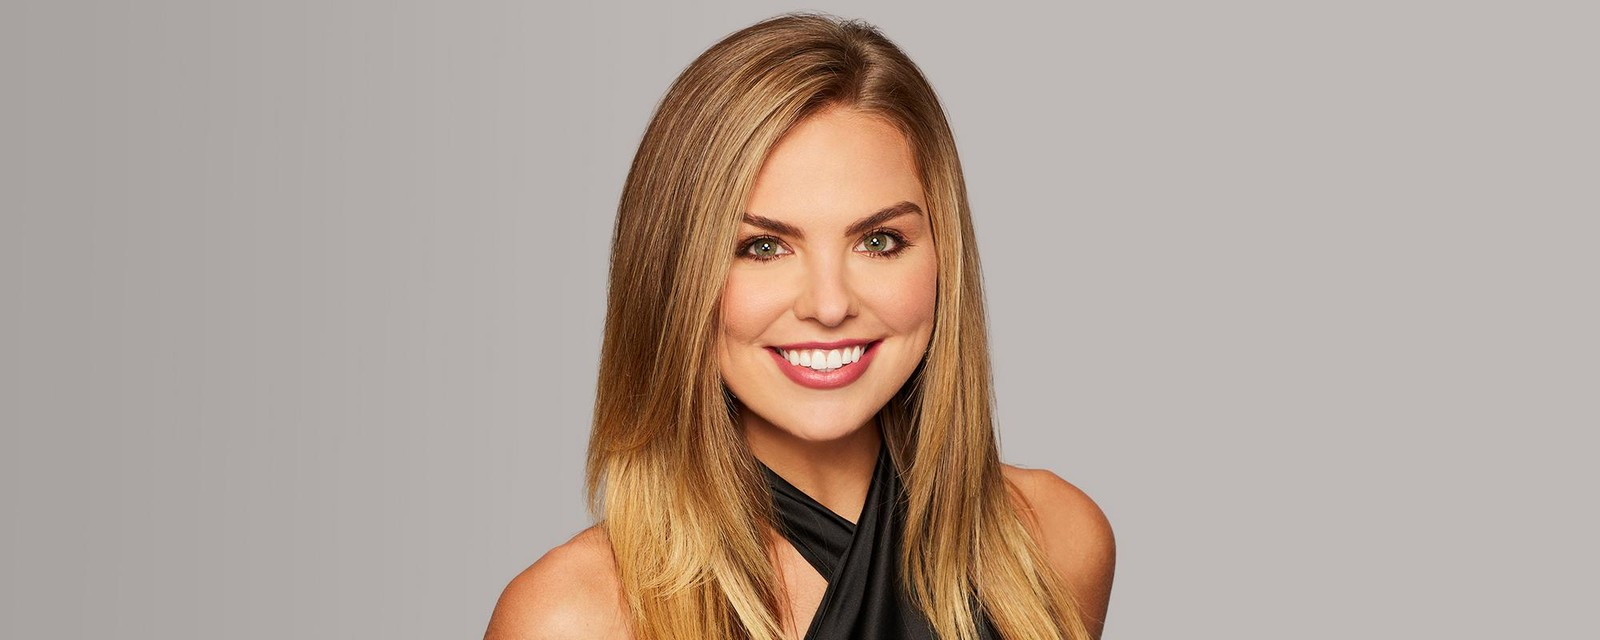 Hannah B Bachelor